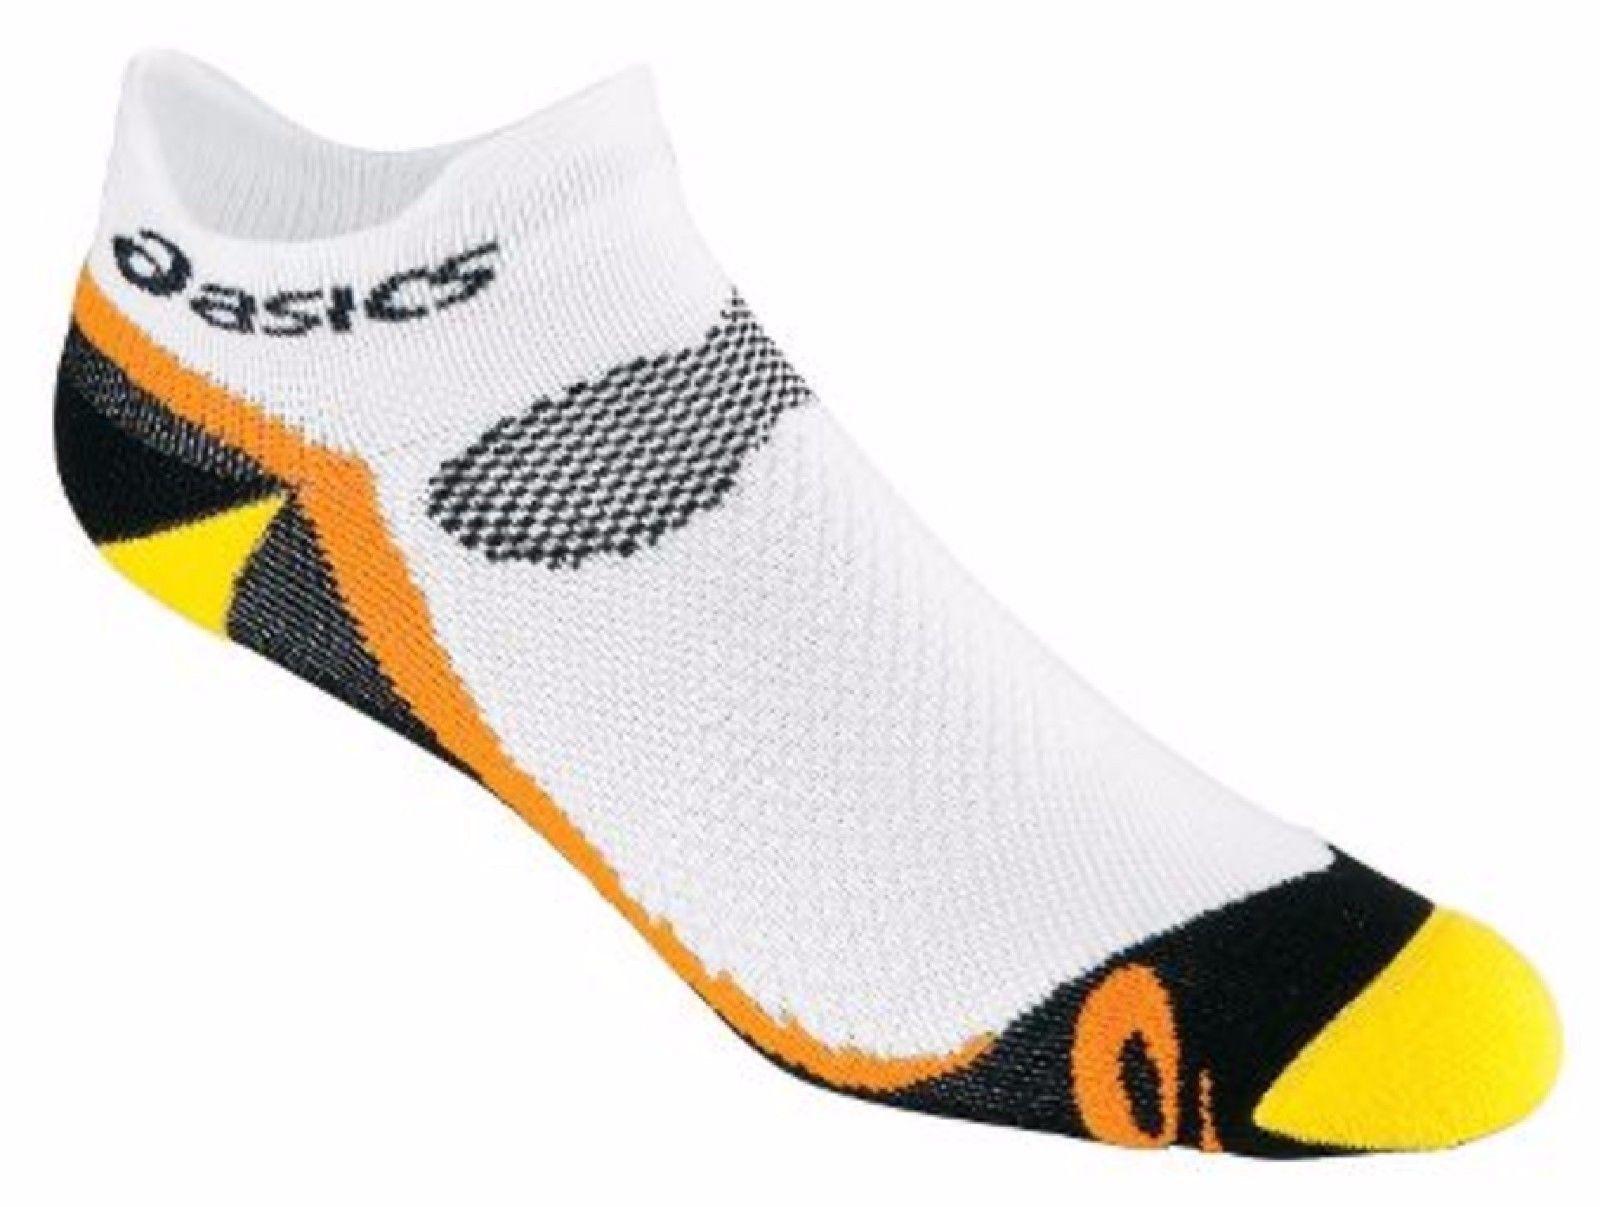 Asics Kayano Classic X-Small XS Low Cut Running Socks Womens Size 4-5.5 EU 34-36